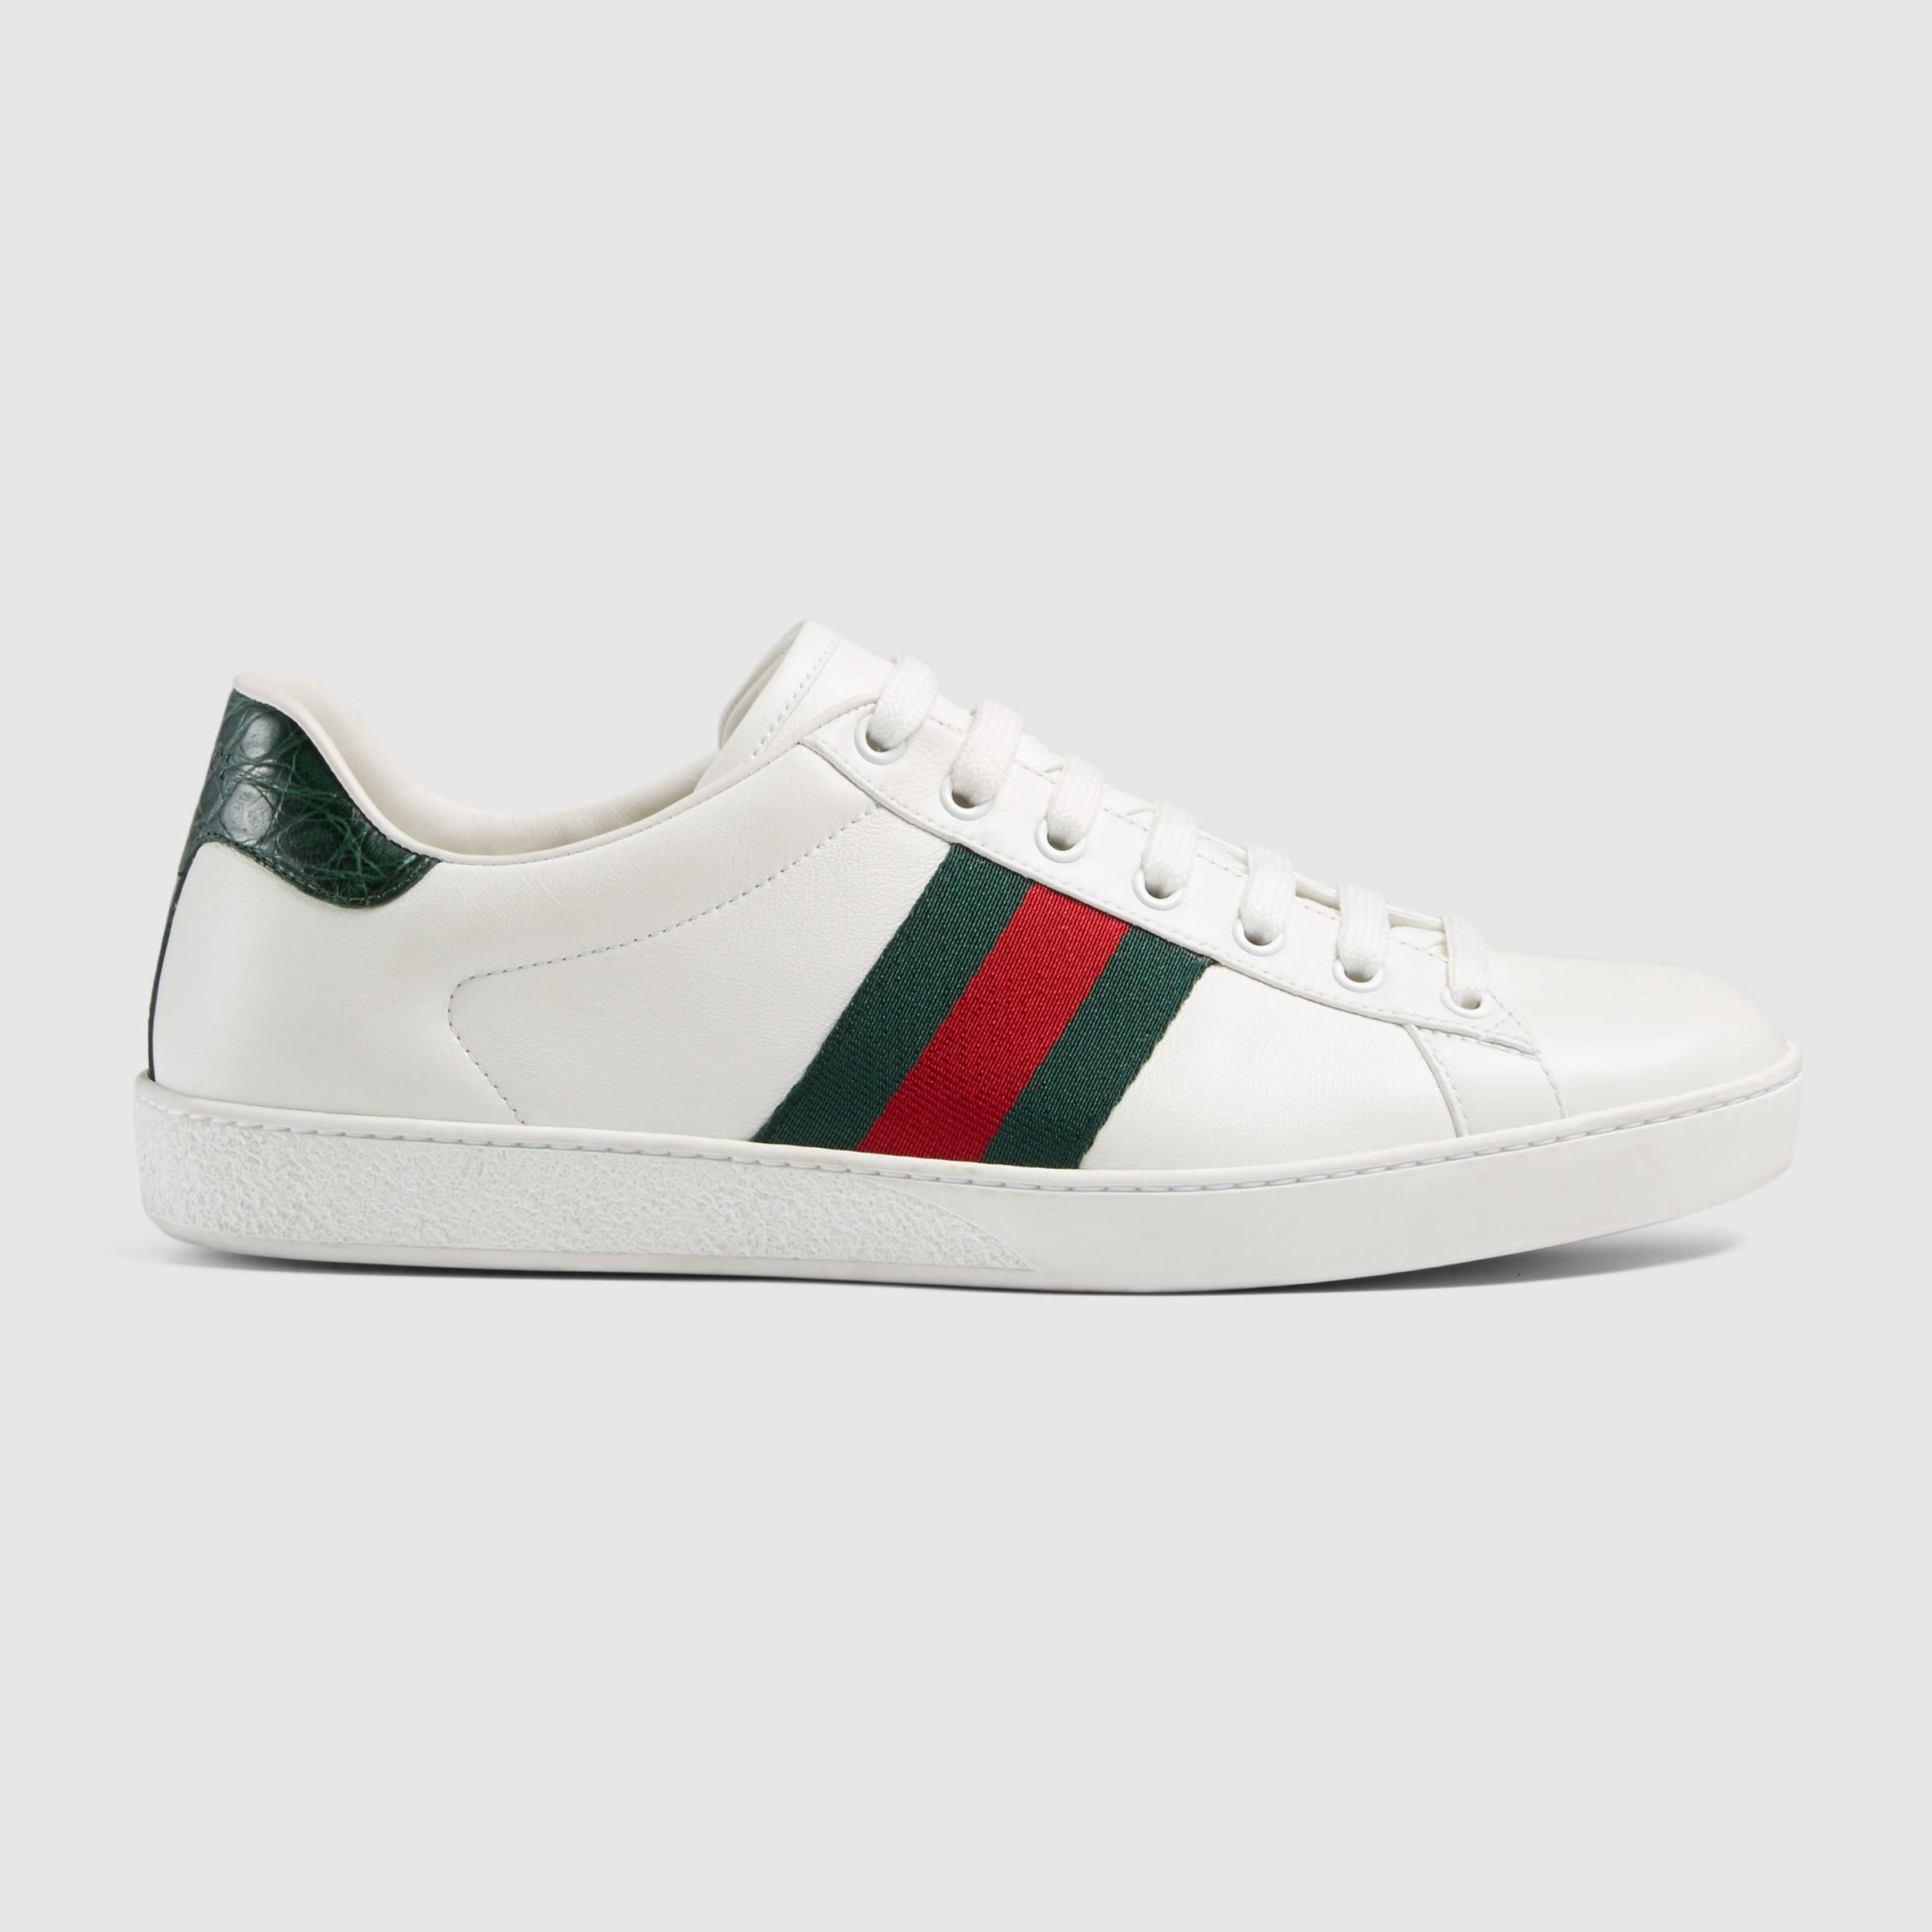 on sale ecf06 49727 GUCCI - Sneaker bassa Ace in pelle, taglia 39 40    450€